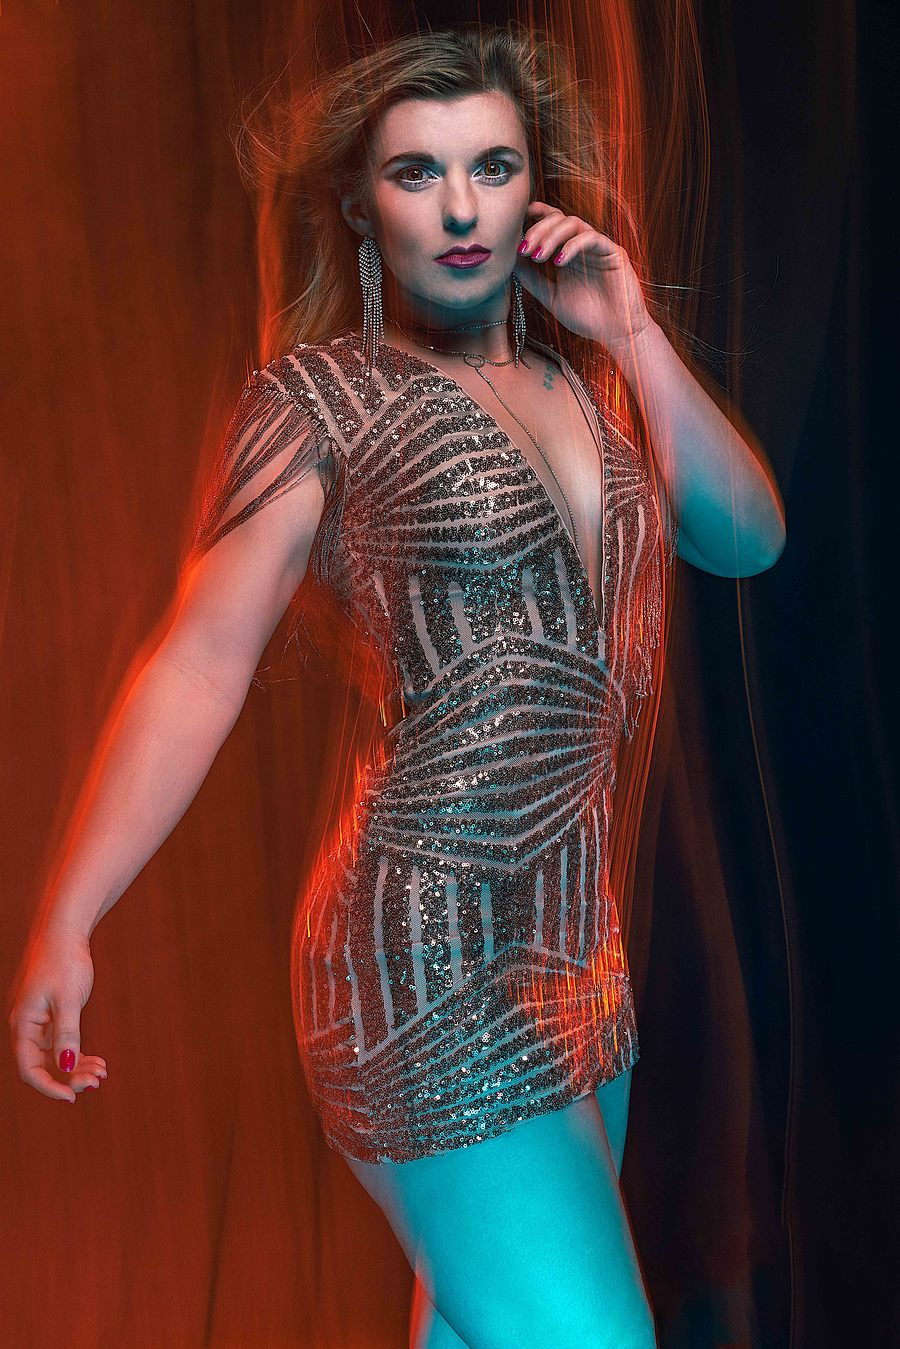 Fire light / Photography by David Abbs, Model Helen-Rose, Taken at Shutter House / Uploaded 17th December 2018 @ 08:06 PM